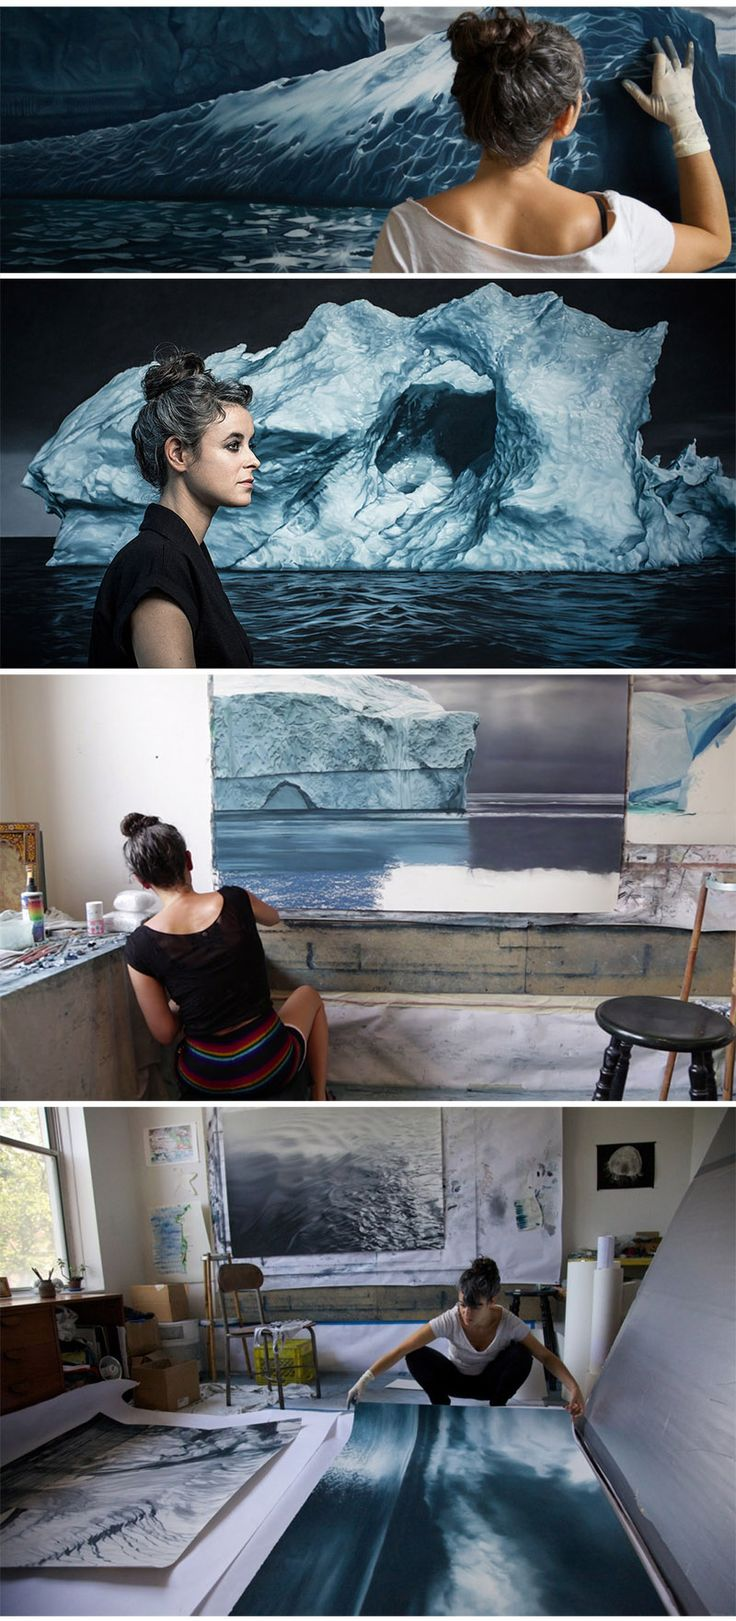 Zaria Forman working in her studio       http://www.zariaforman.com/